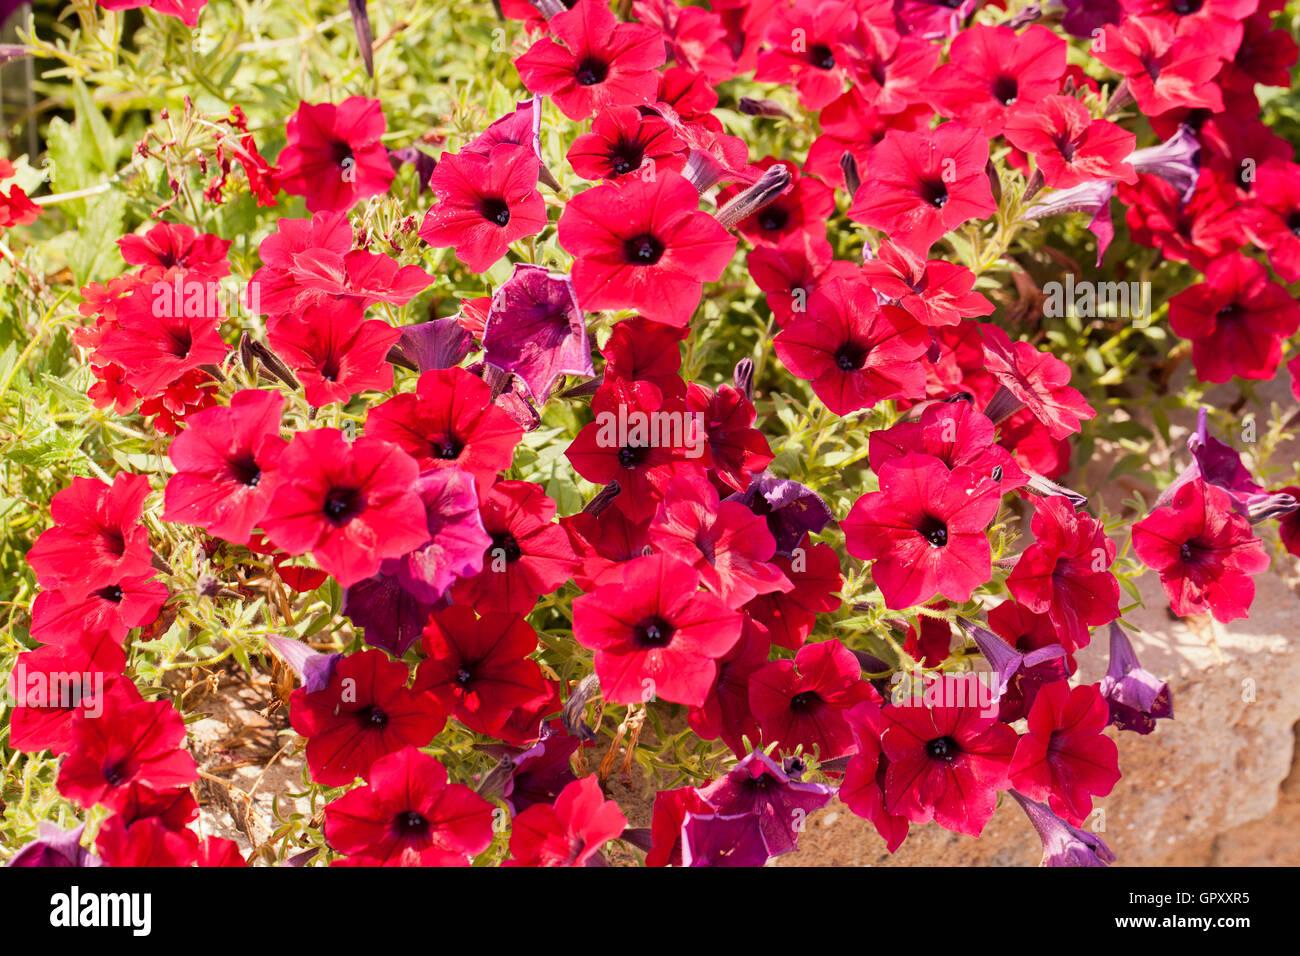 Verveine fleurs de jardin (Verveine) - USA Banque D\'Images, Photo ...